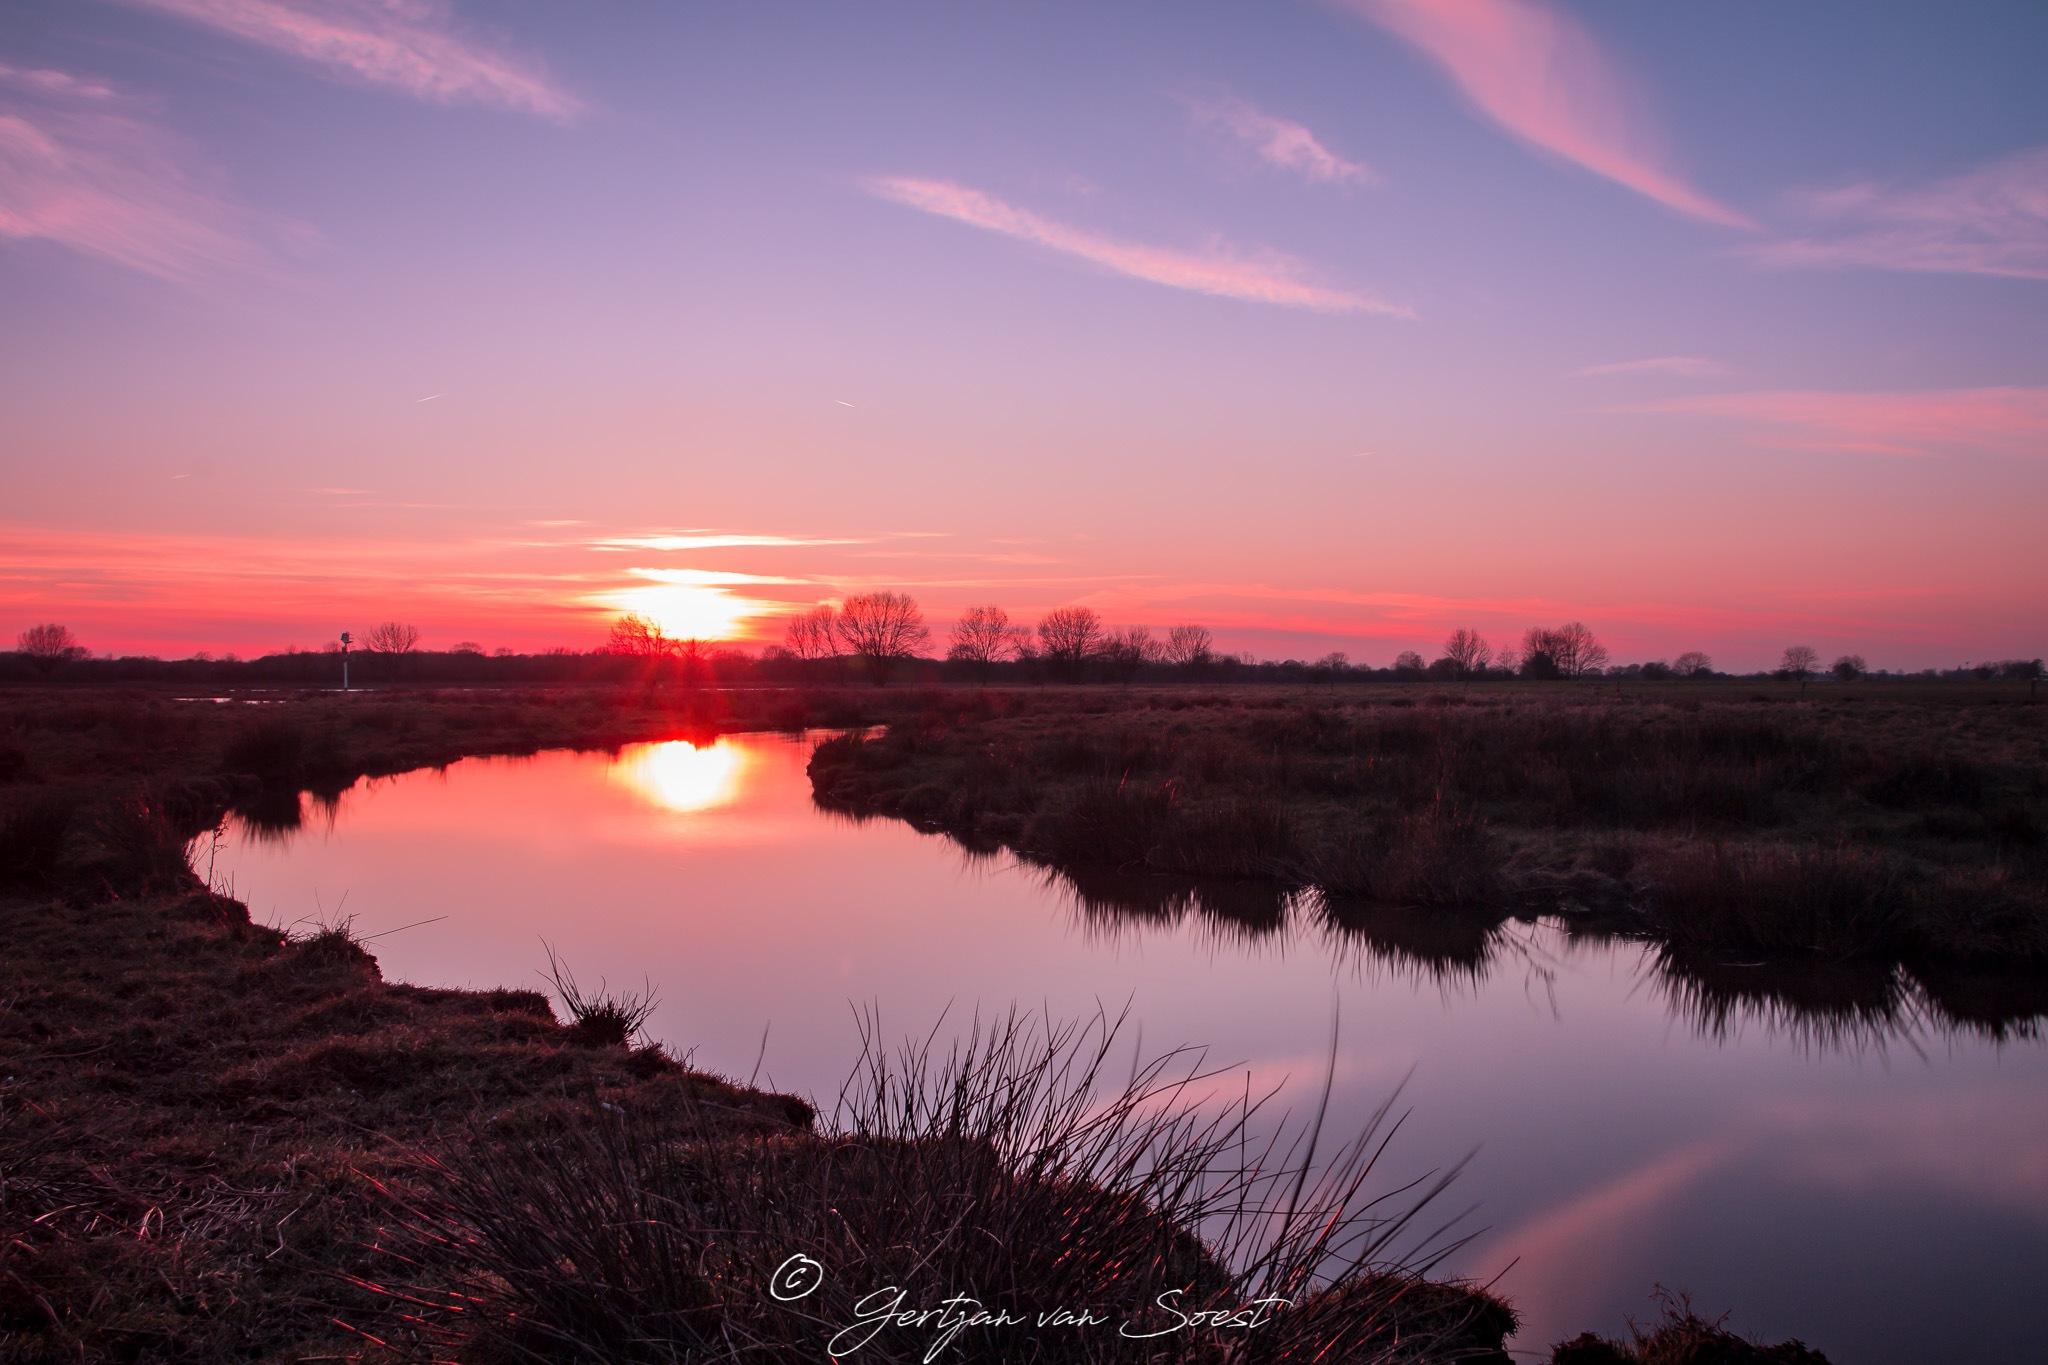 Sunset near the river Maas @ NP Maasduinen by Gertjan van Soest